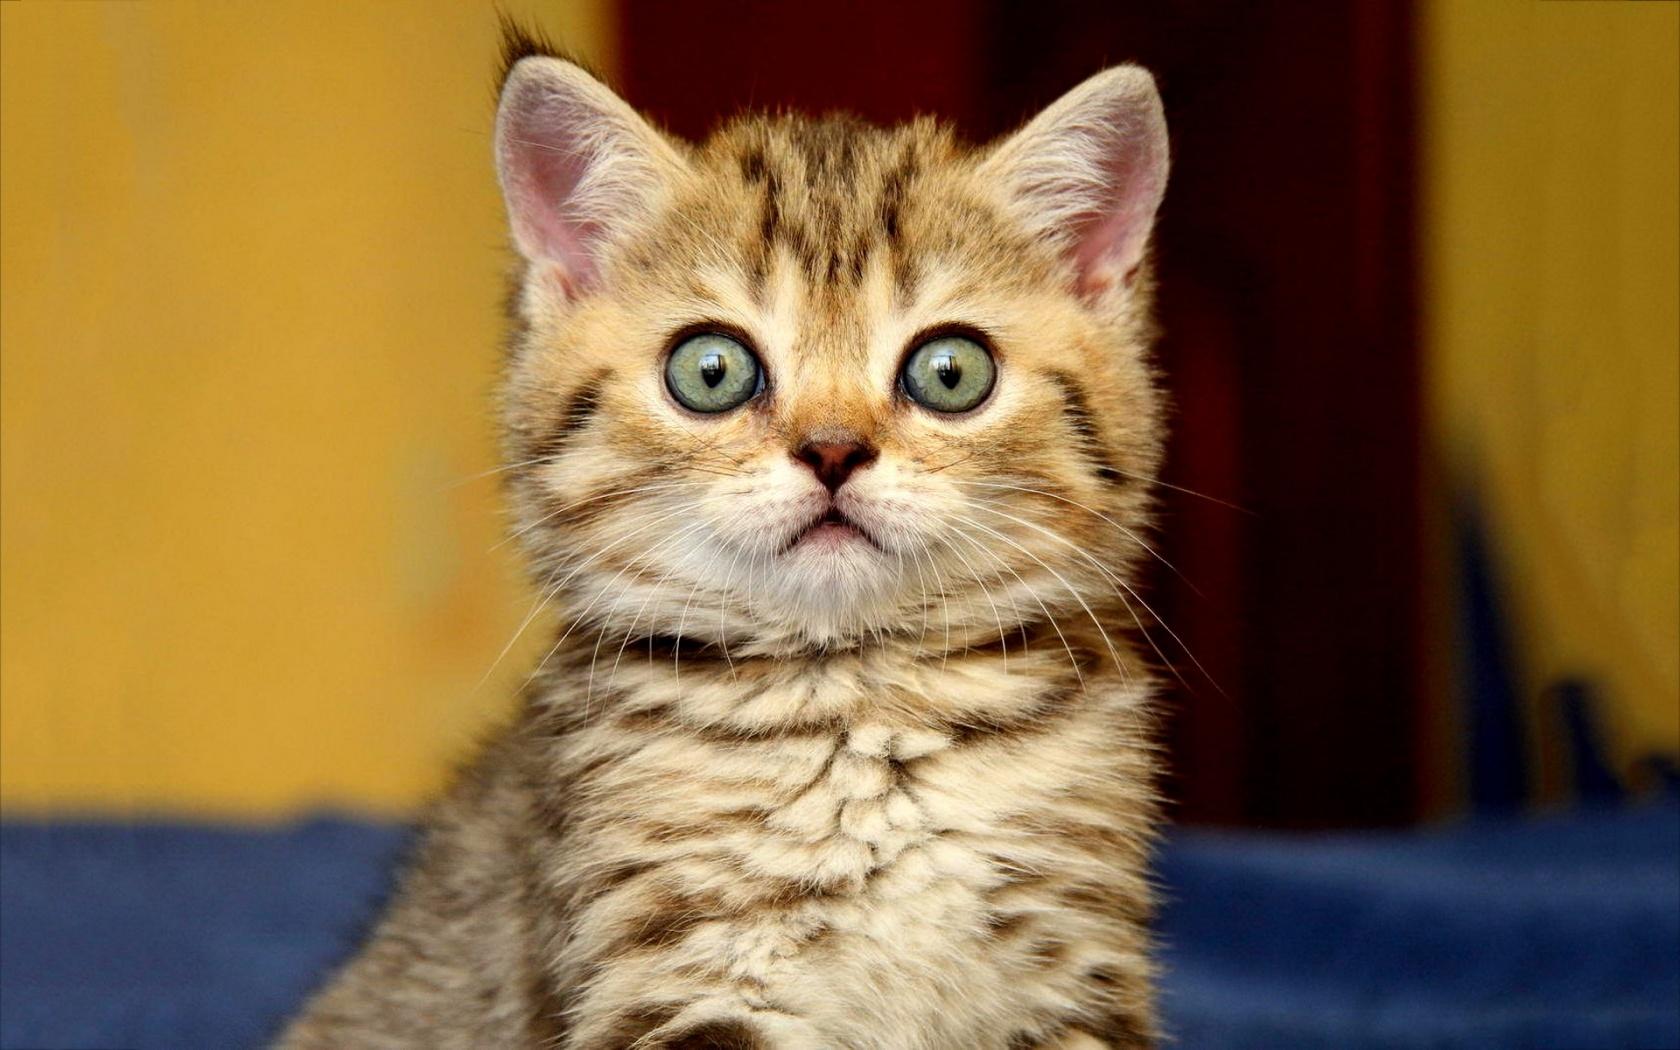 Big kitten eyes Wallpaper in 1680x1050 Widescreen